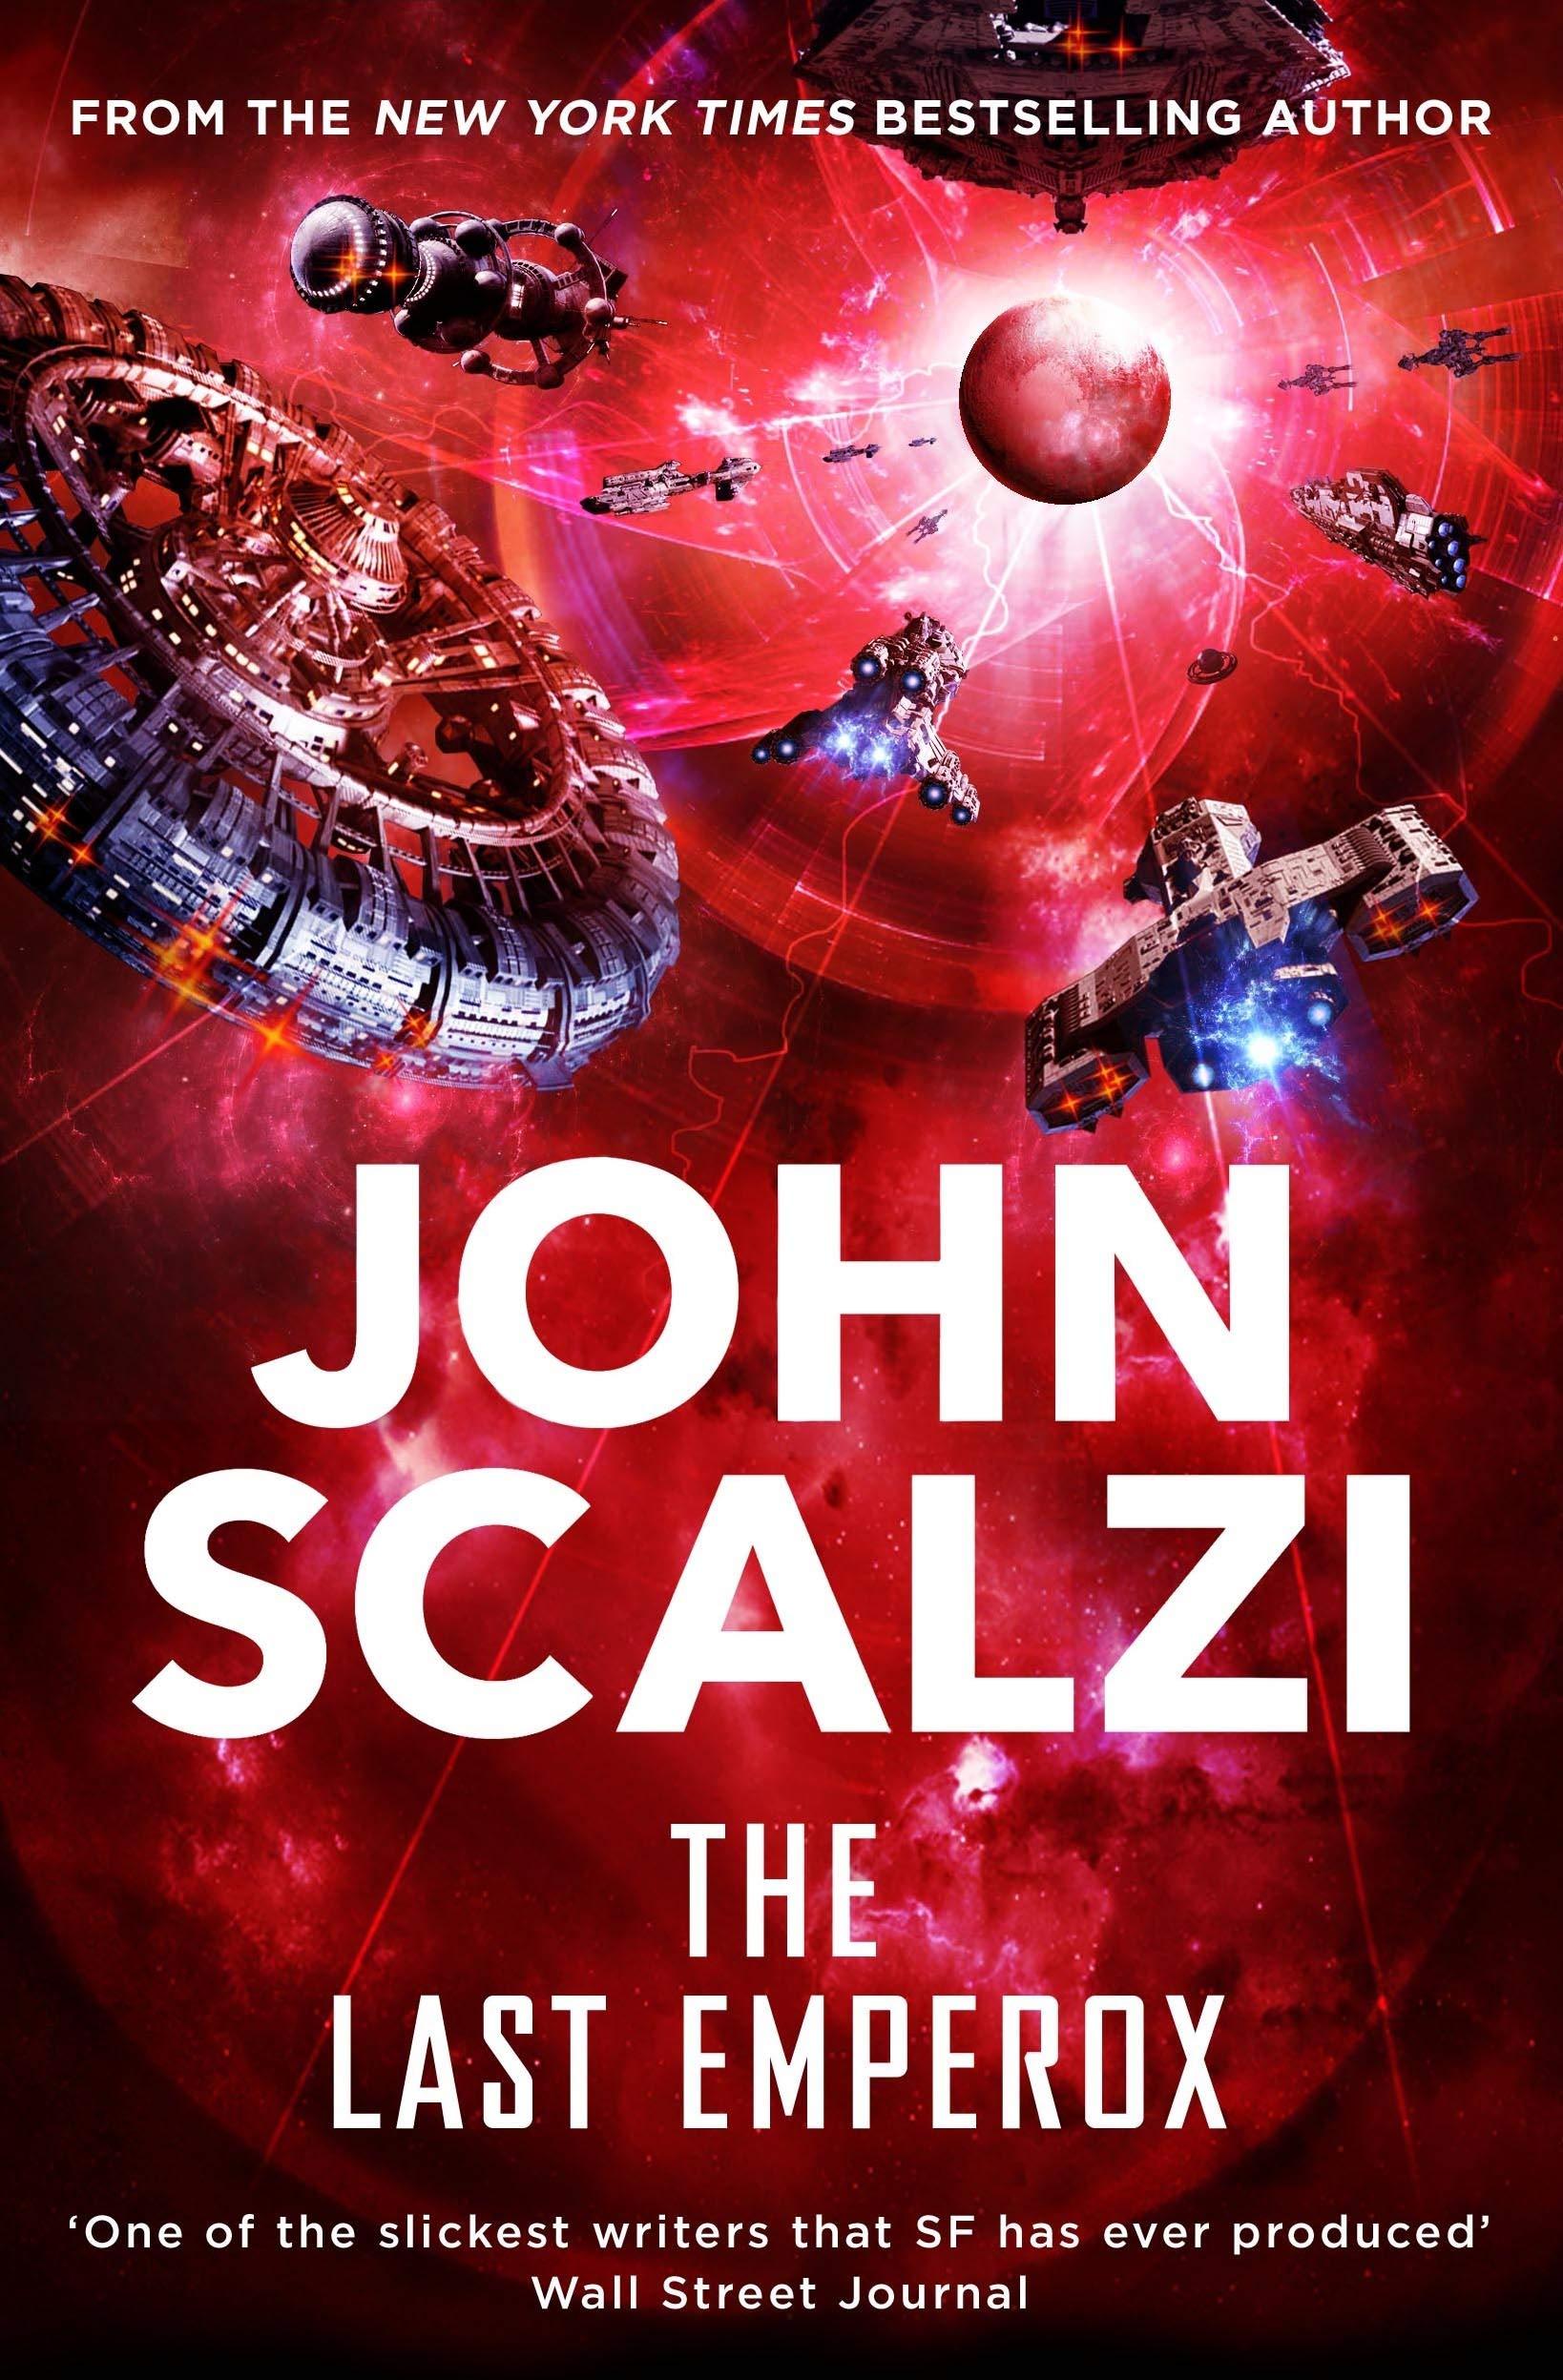 « The Last Emperox », de John Scalzi